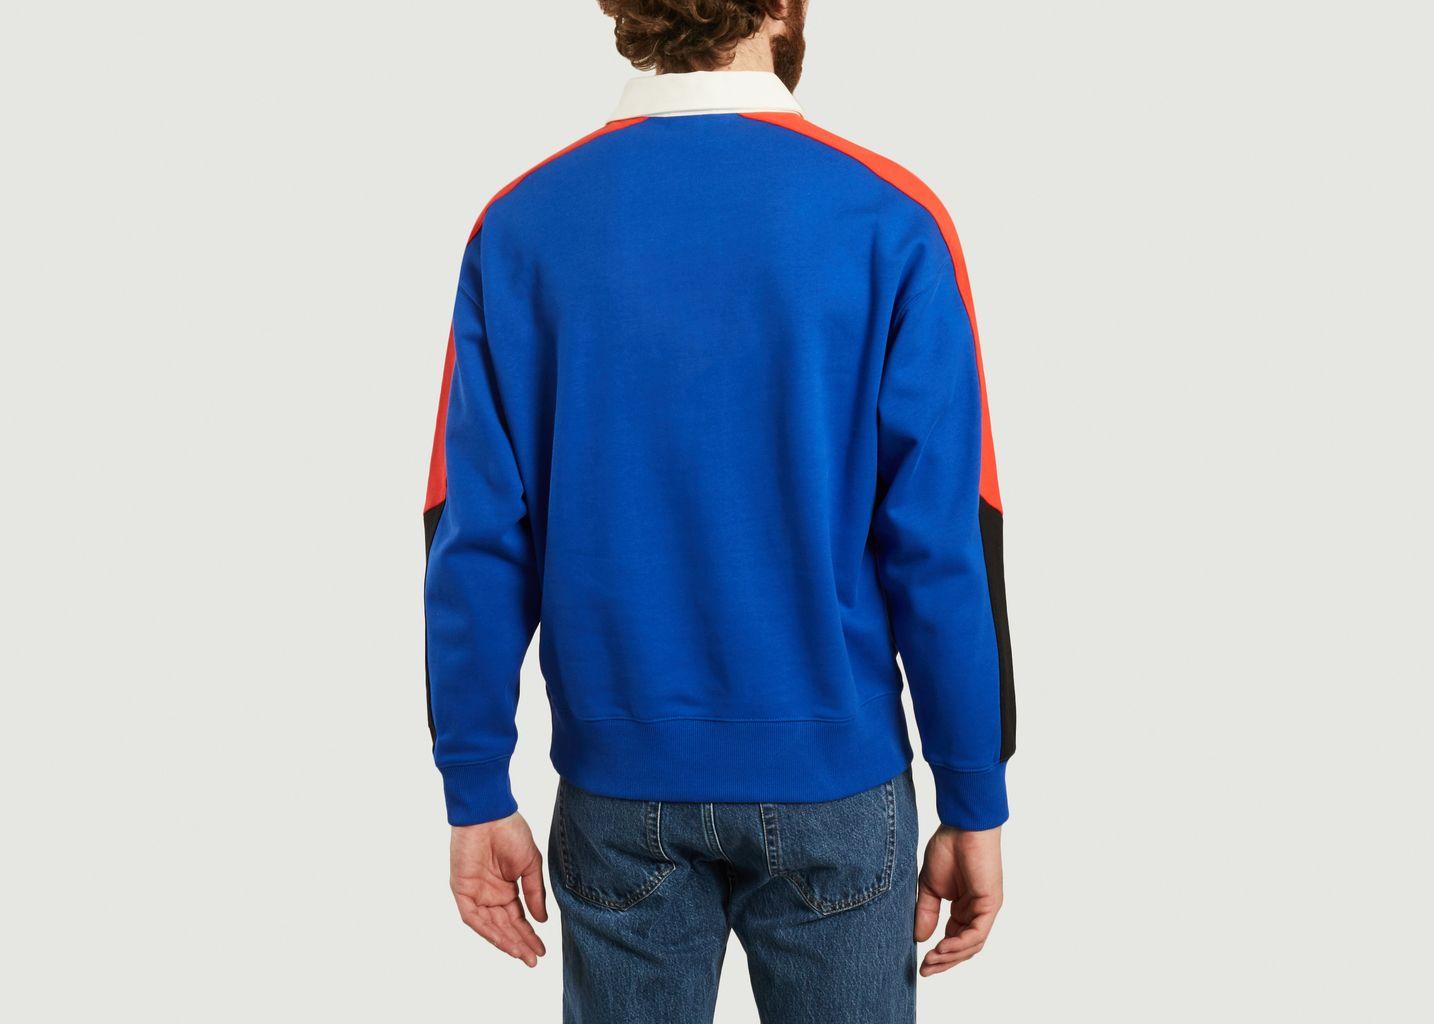 Sweatshirt Lacoste Live - Lacoste